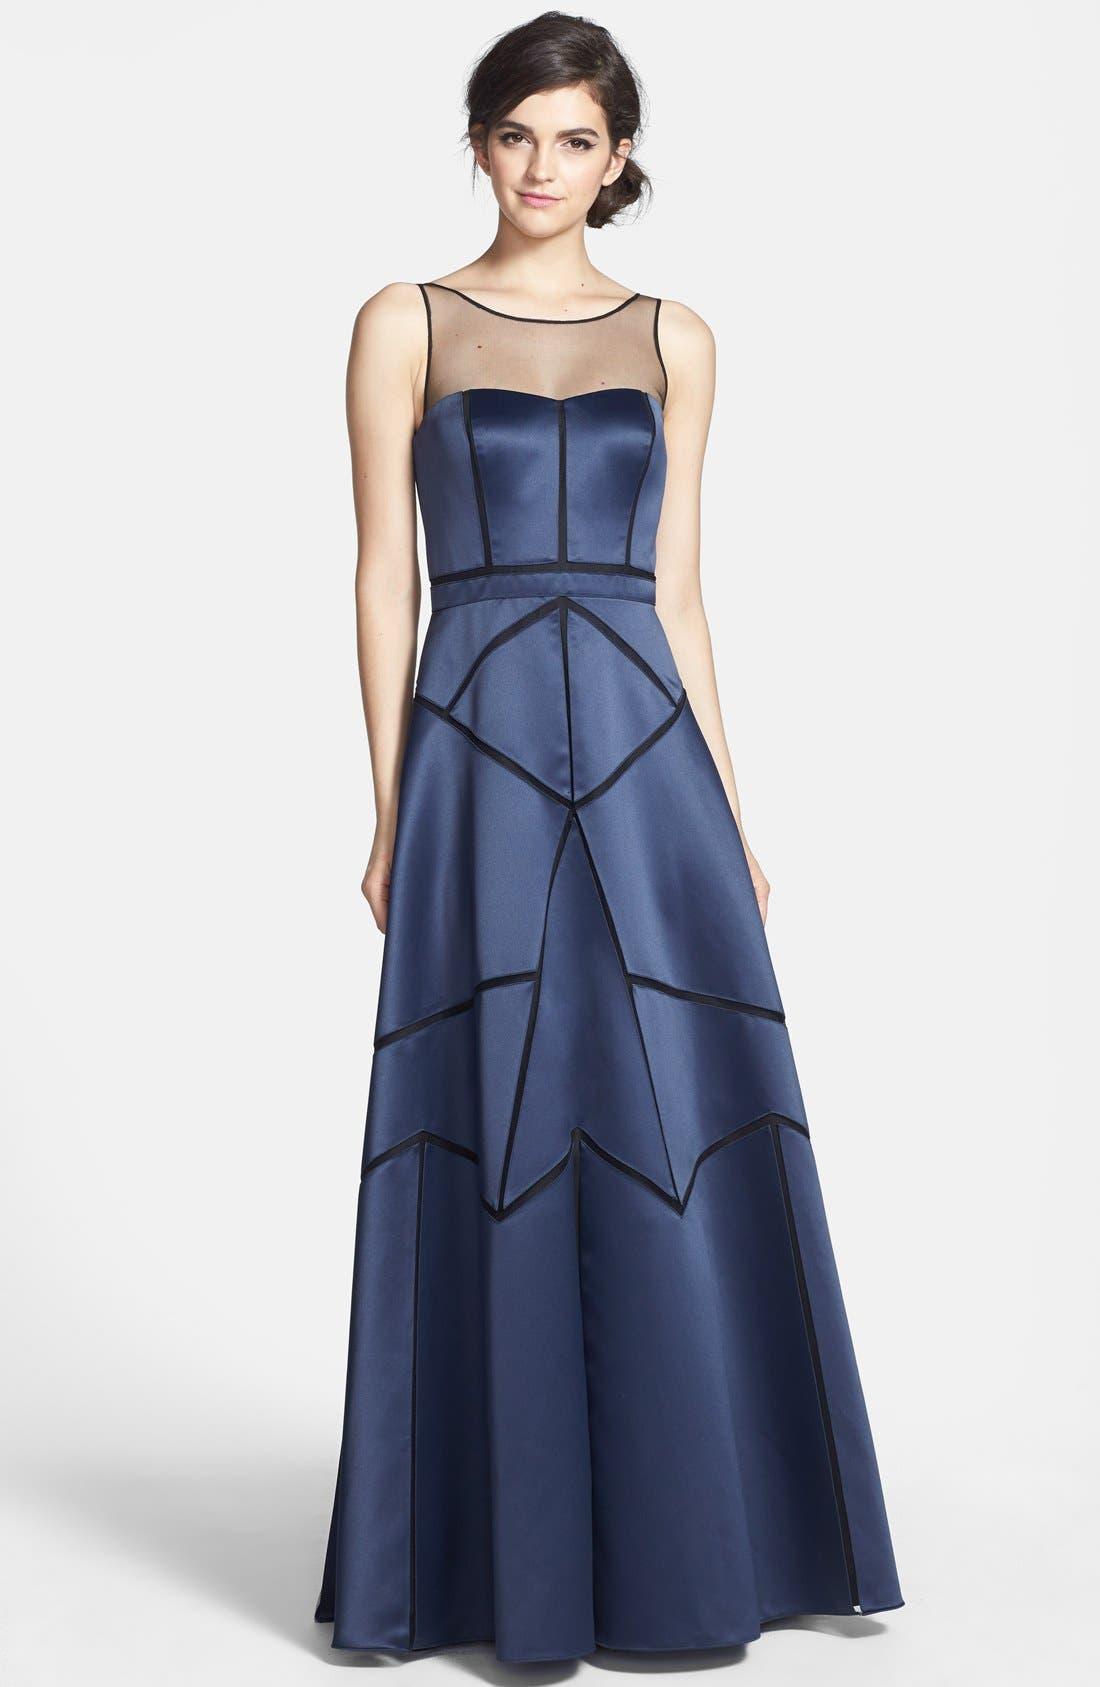 Main Image - Aidan Mattox Illusion Neck Seam Detail Satin Gown